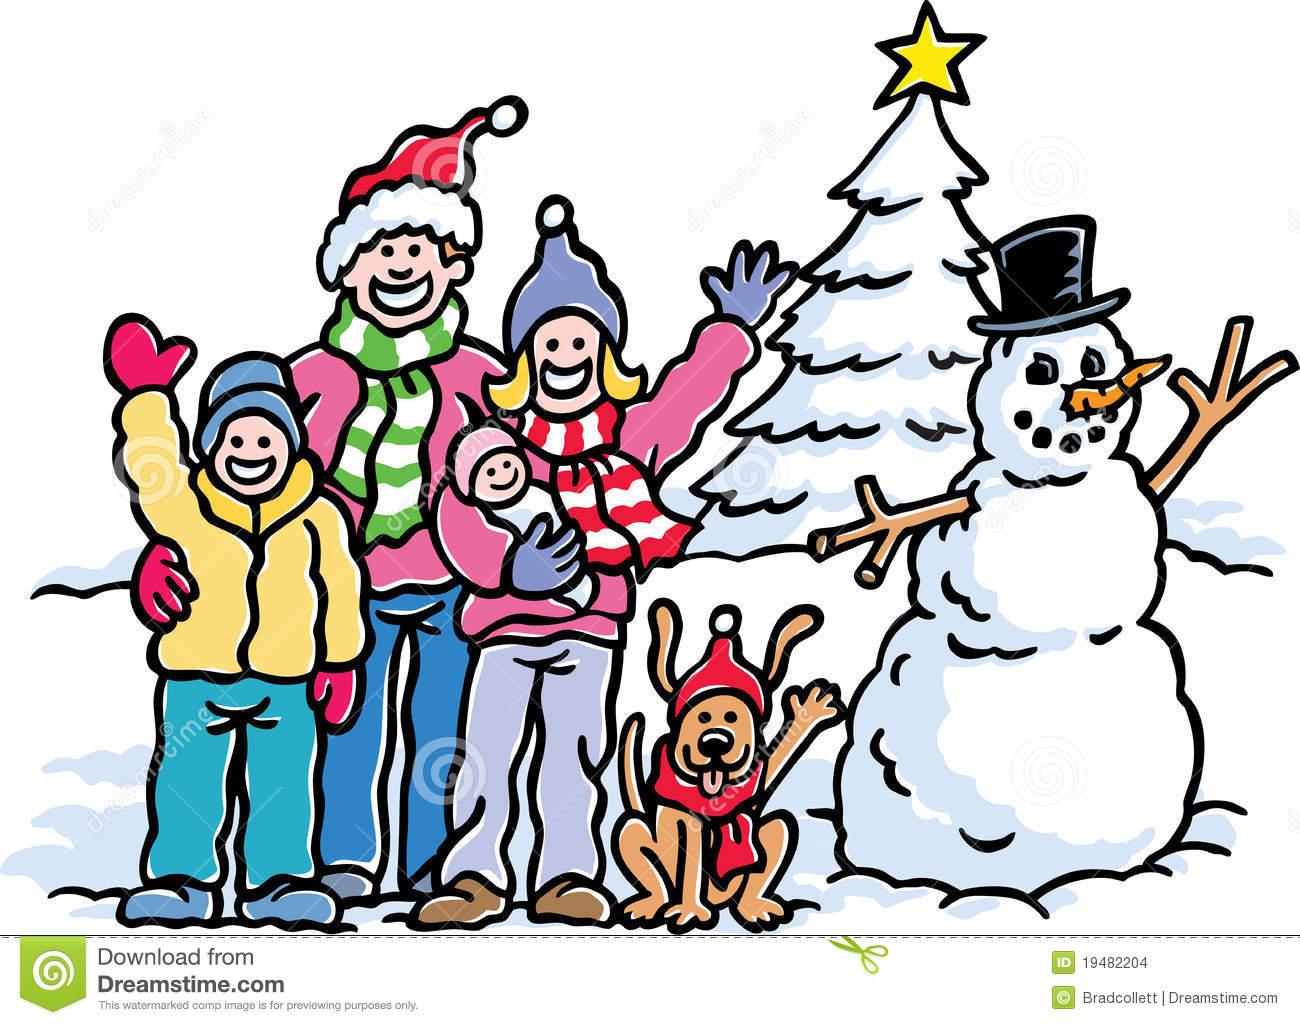 Holydays clipart family holiday Clipart art Clip (63+) family